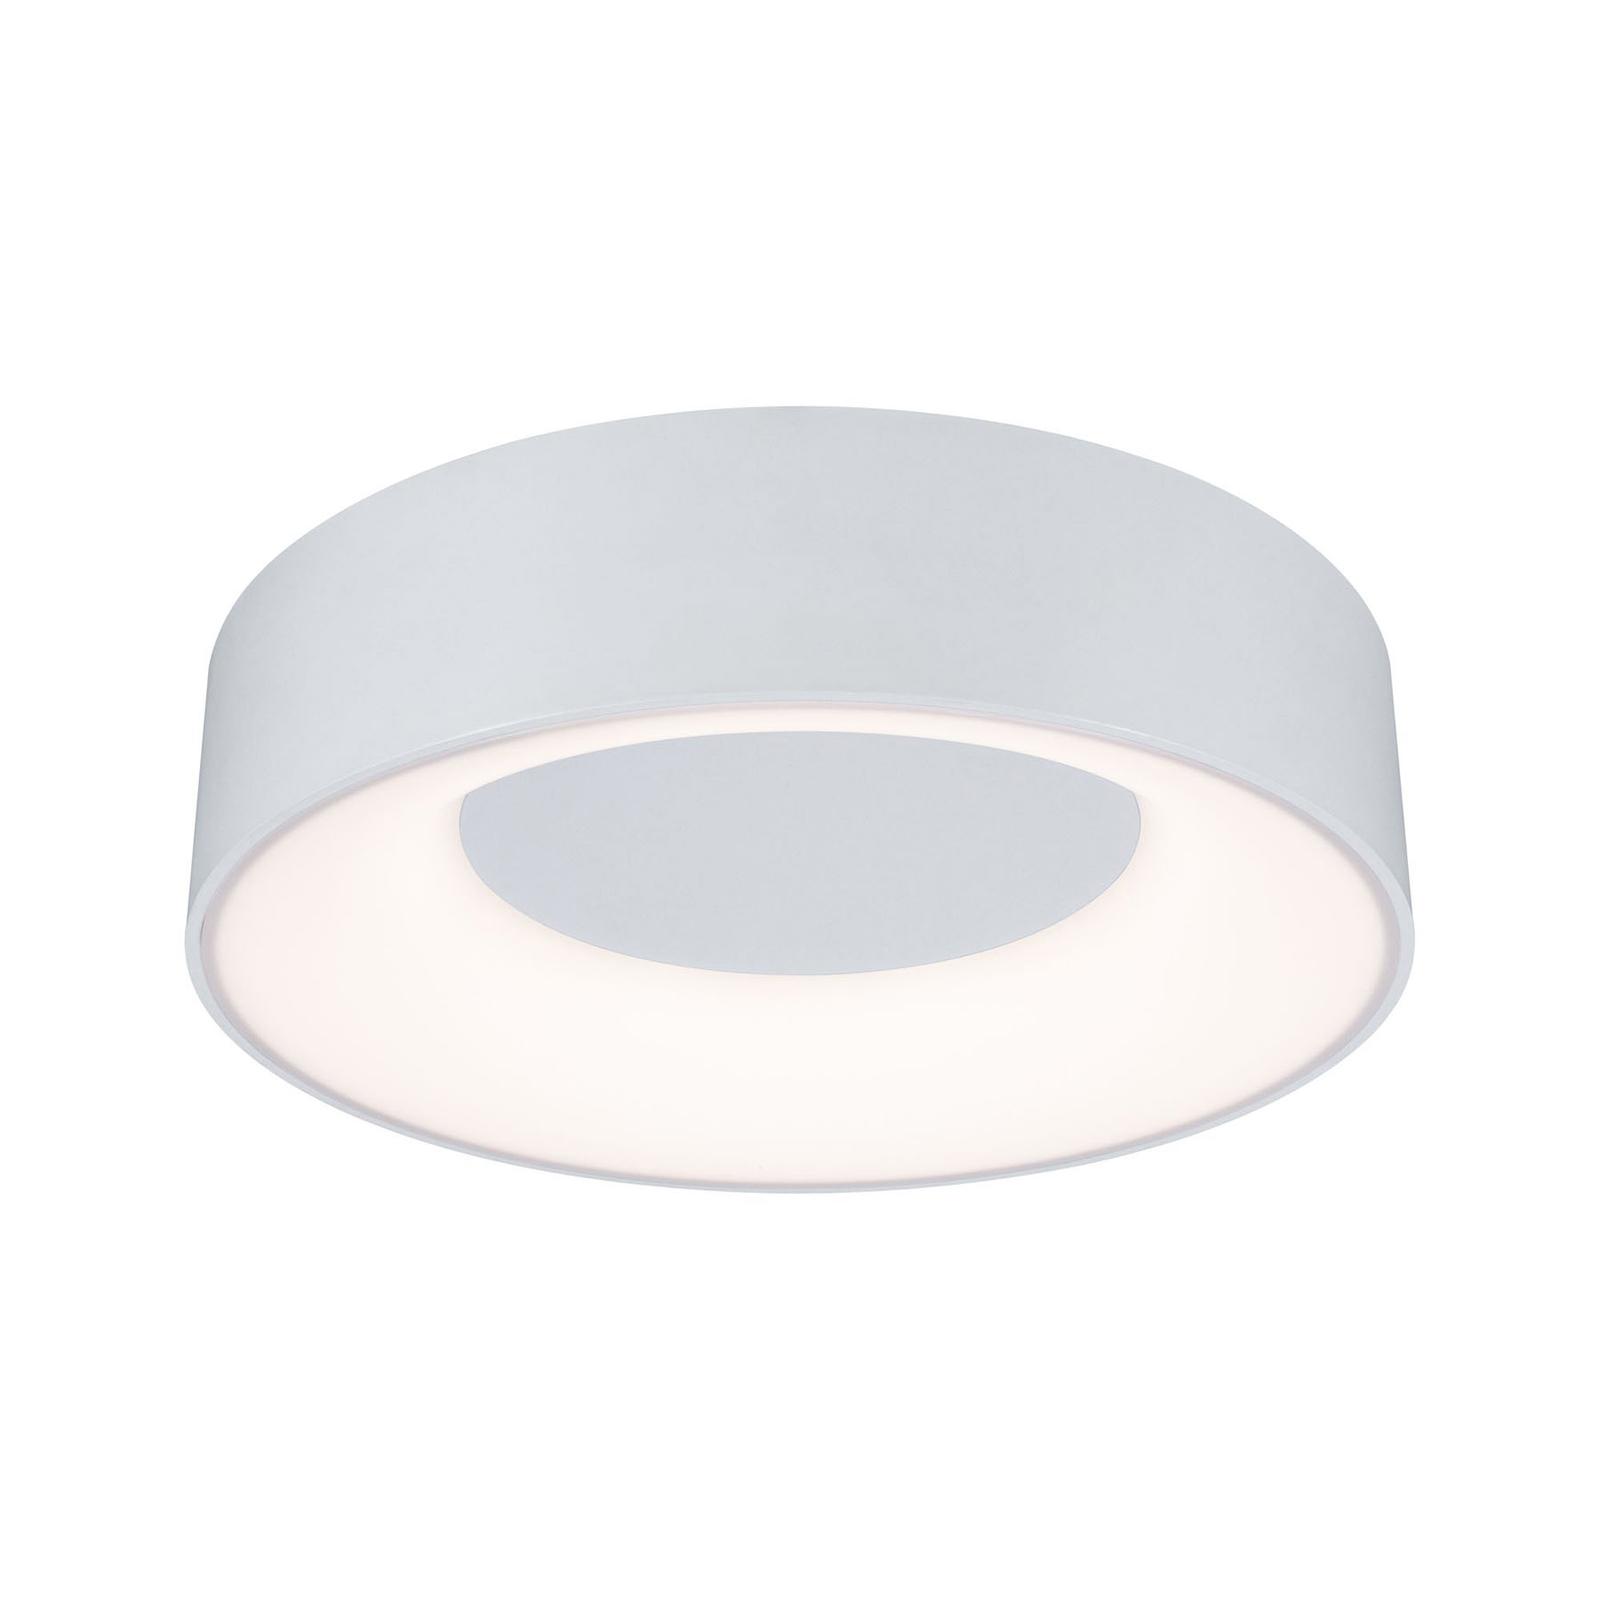 Paulmann HomeSpa Casca lampa sufitowa LED, Ø 30 cm